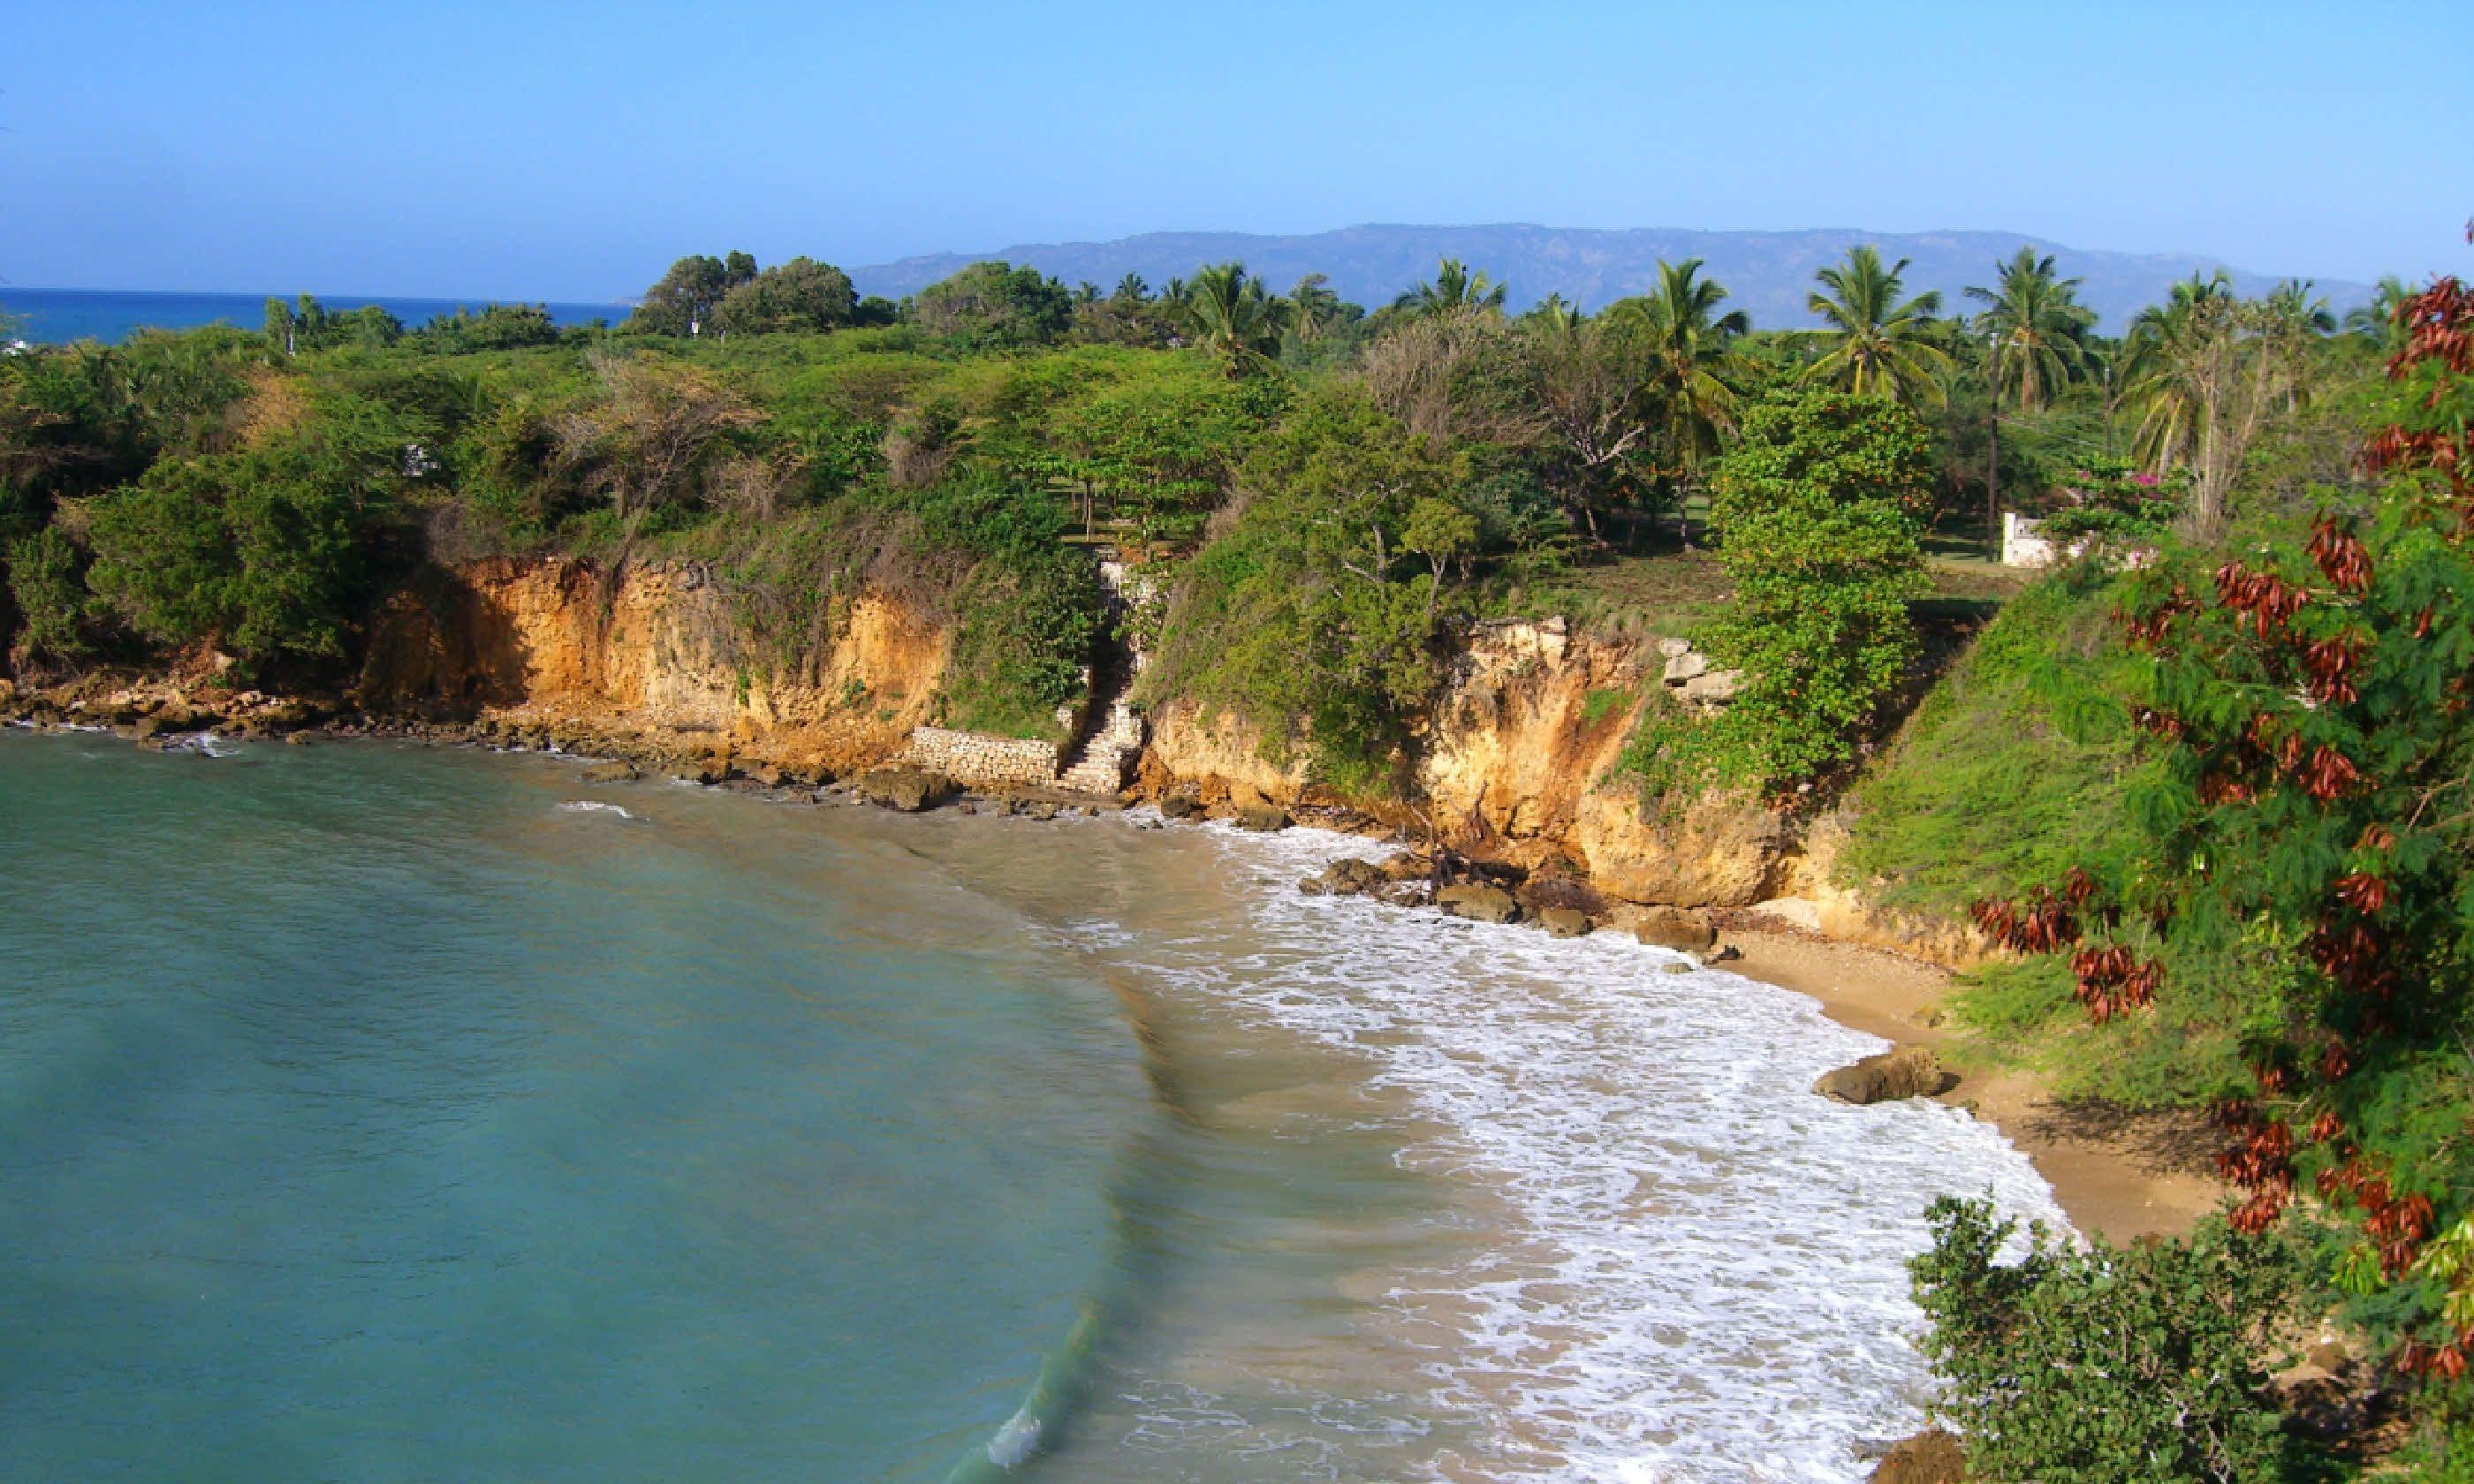 Island cove, Haiti (Shutterstock)